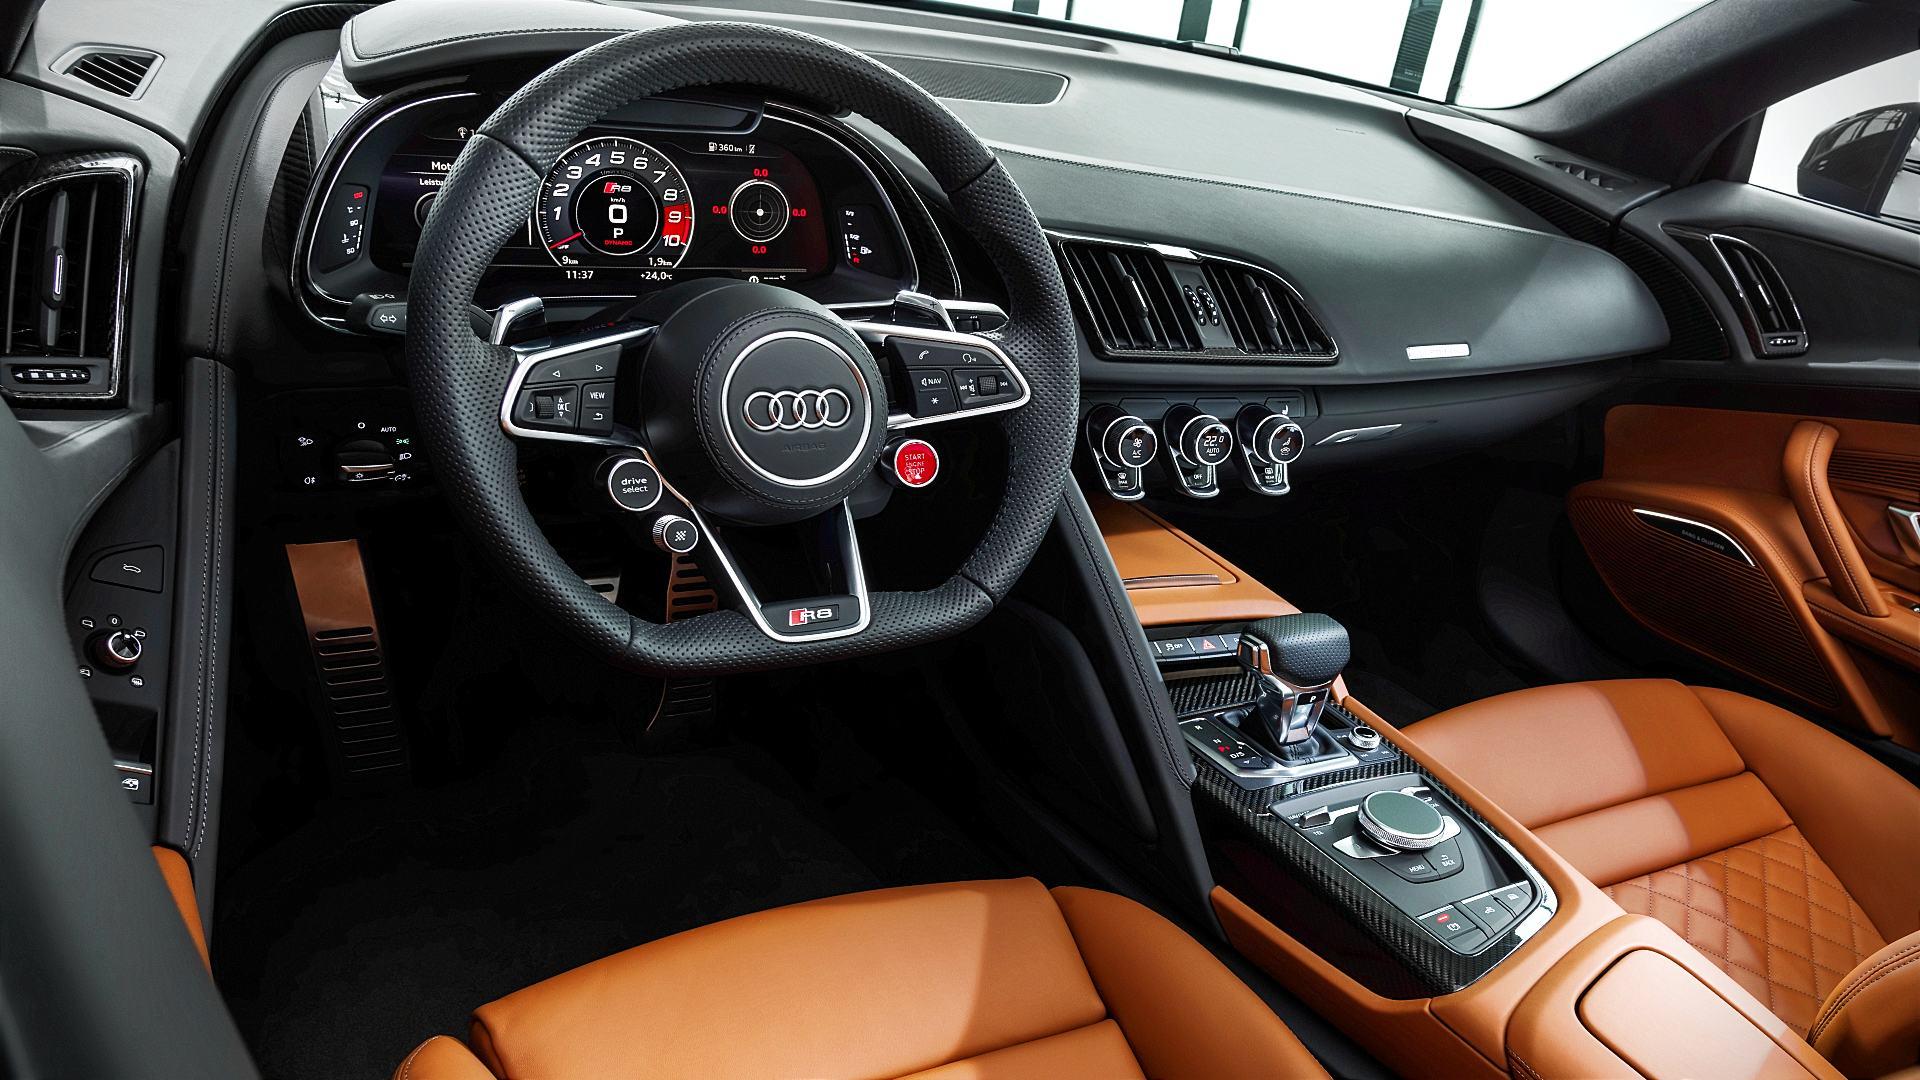 2020 Audi R8 V10 Performance Spyder Interior